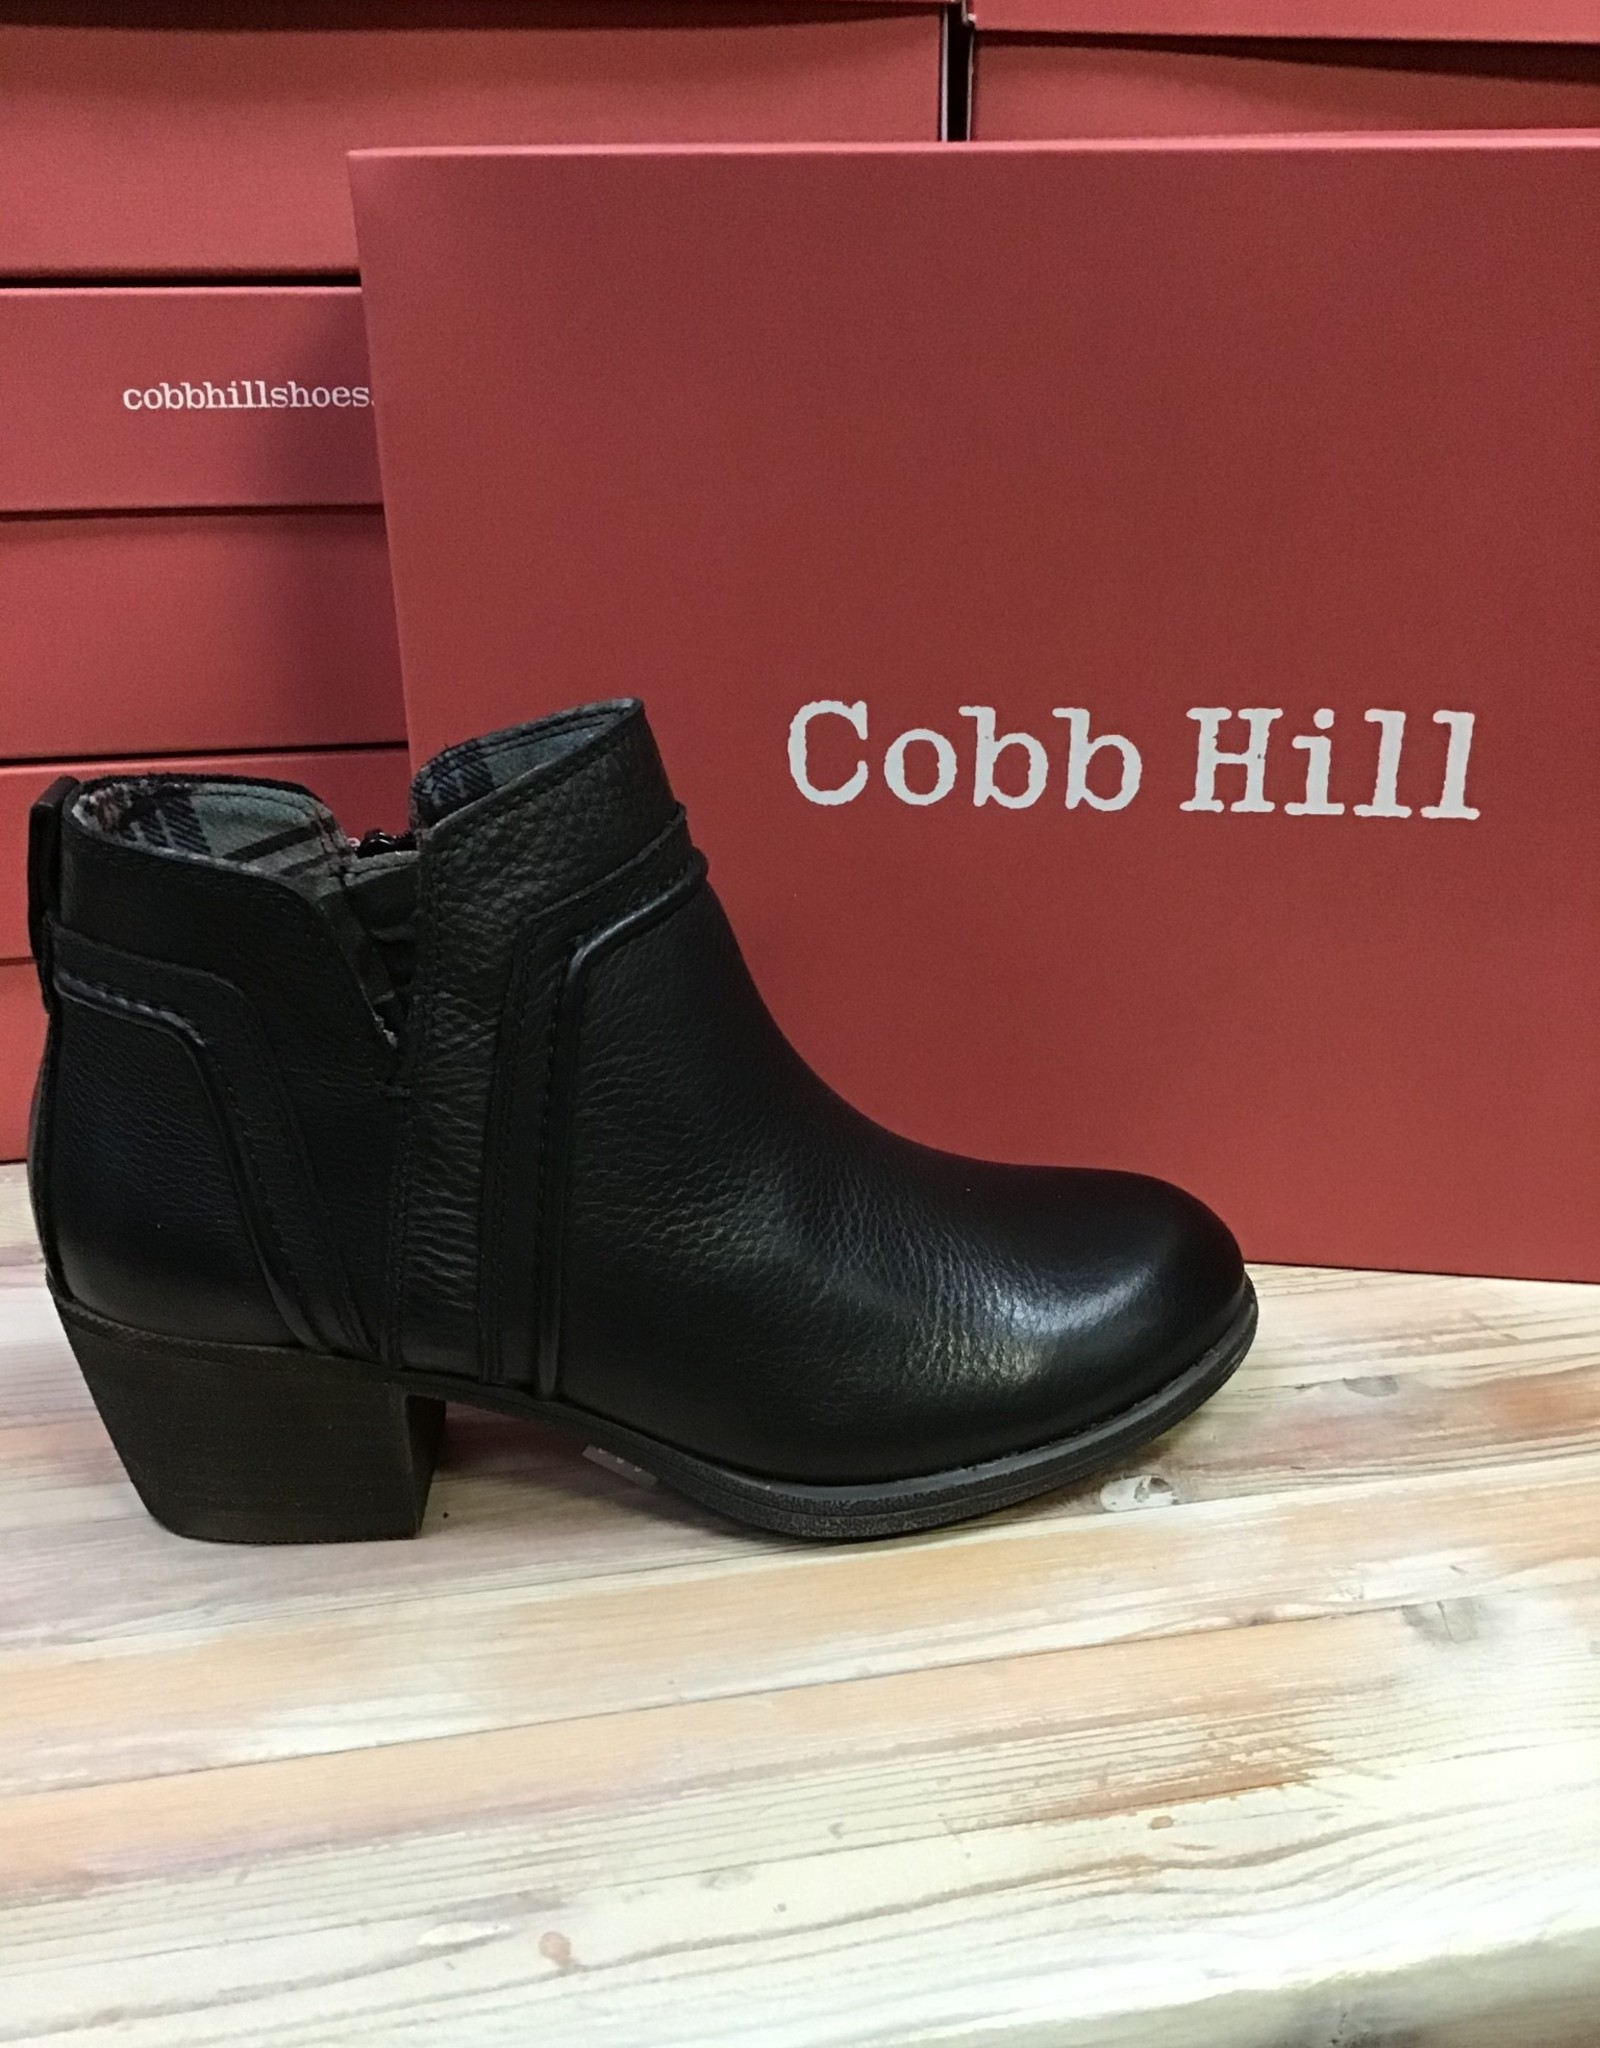 Rockport Rockport Cobb Hill  Anisa V Cut Bootie Ladies'